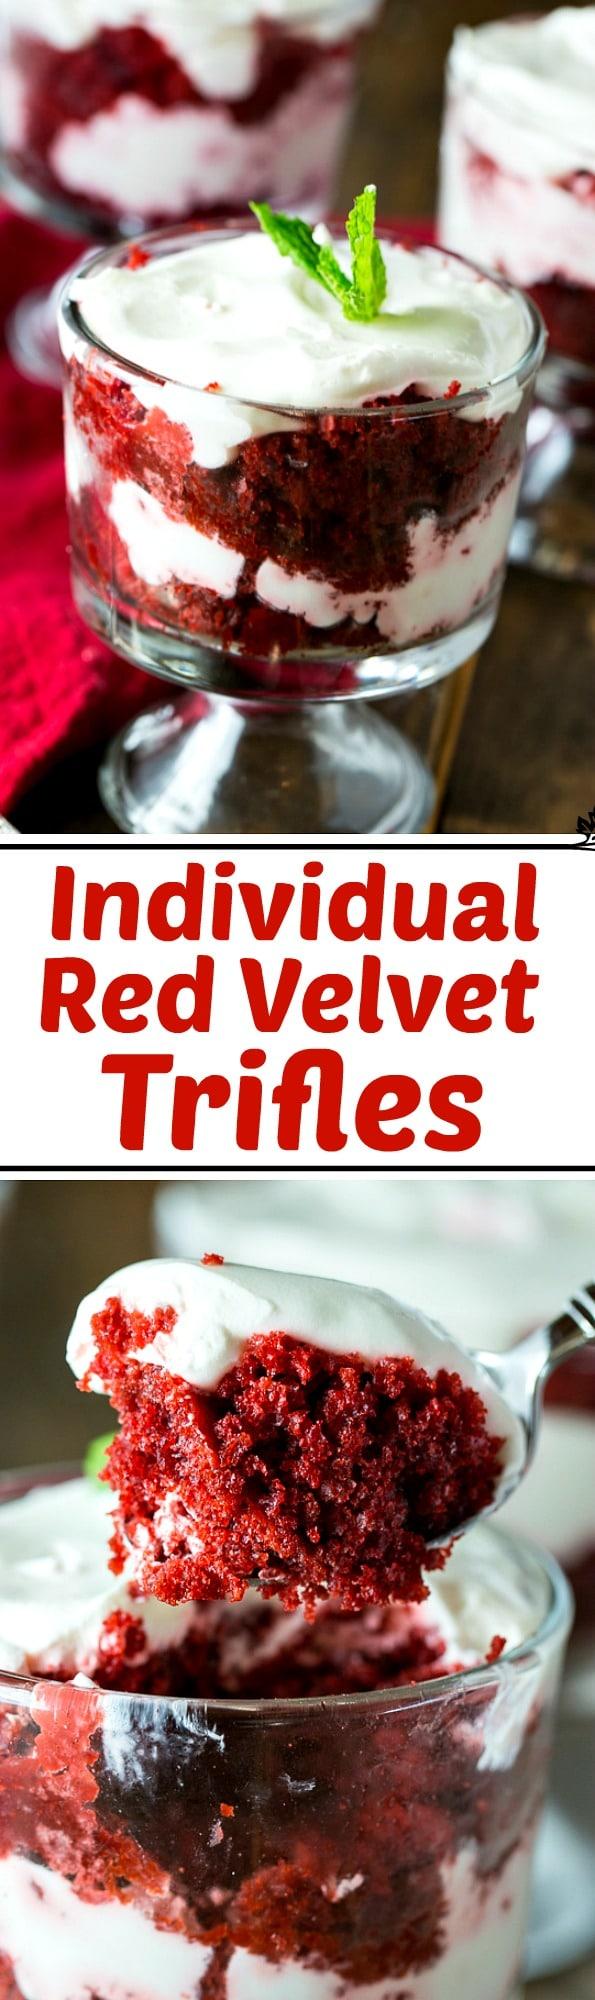 Individual Red Velvet Trifles